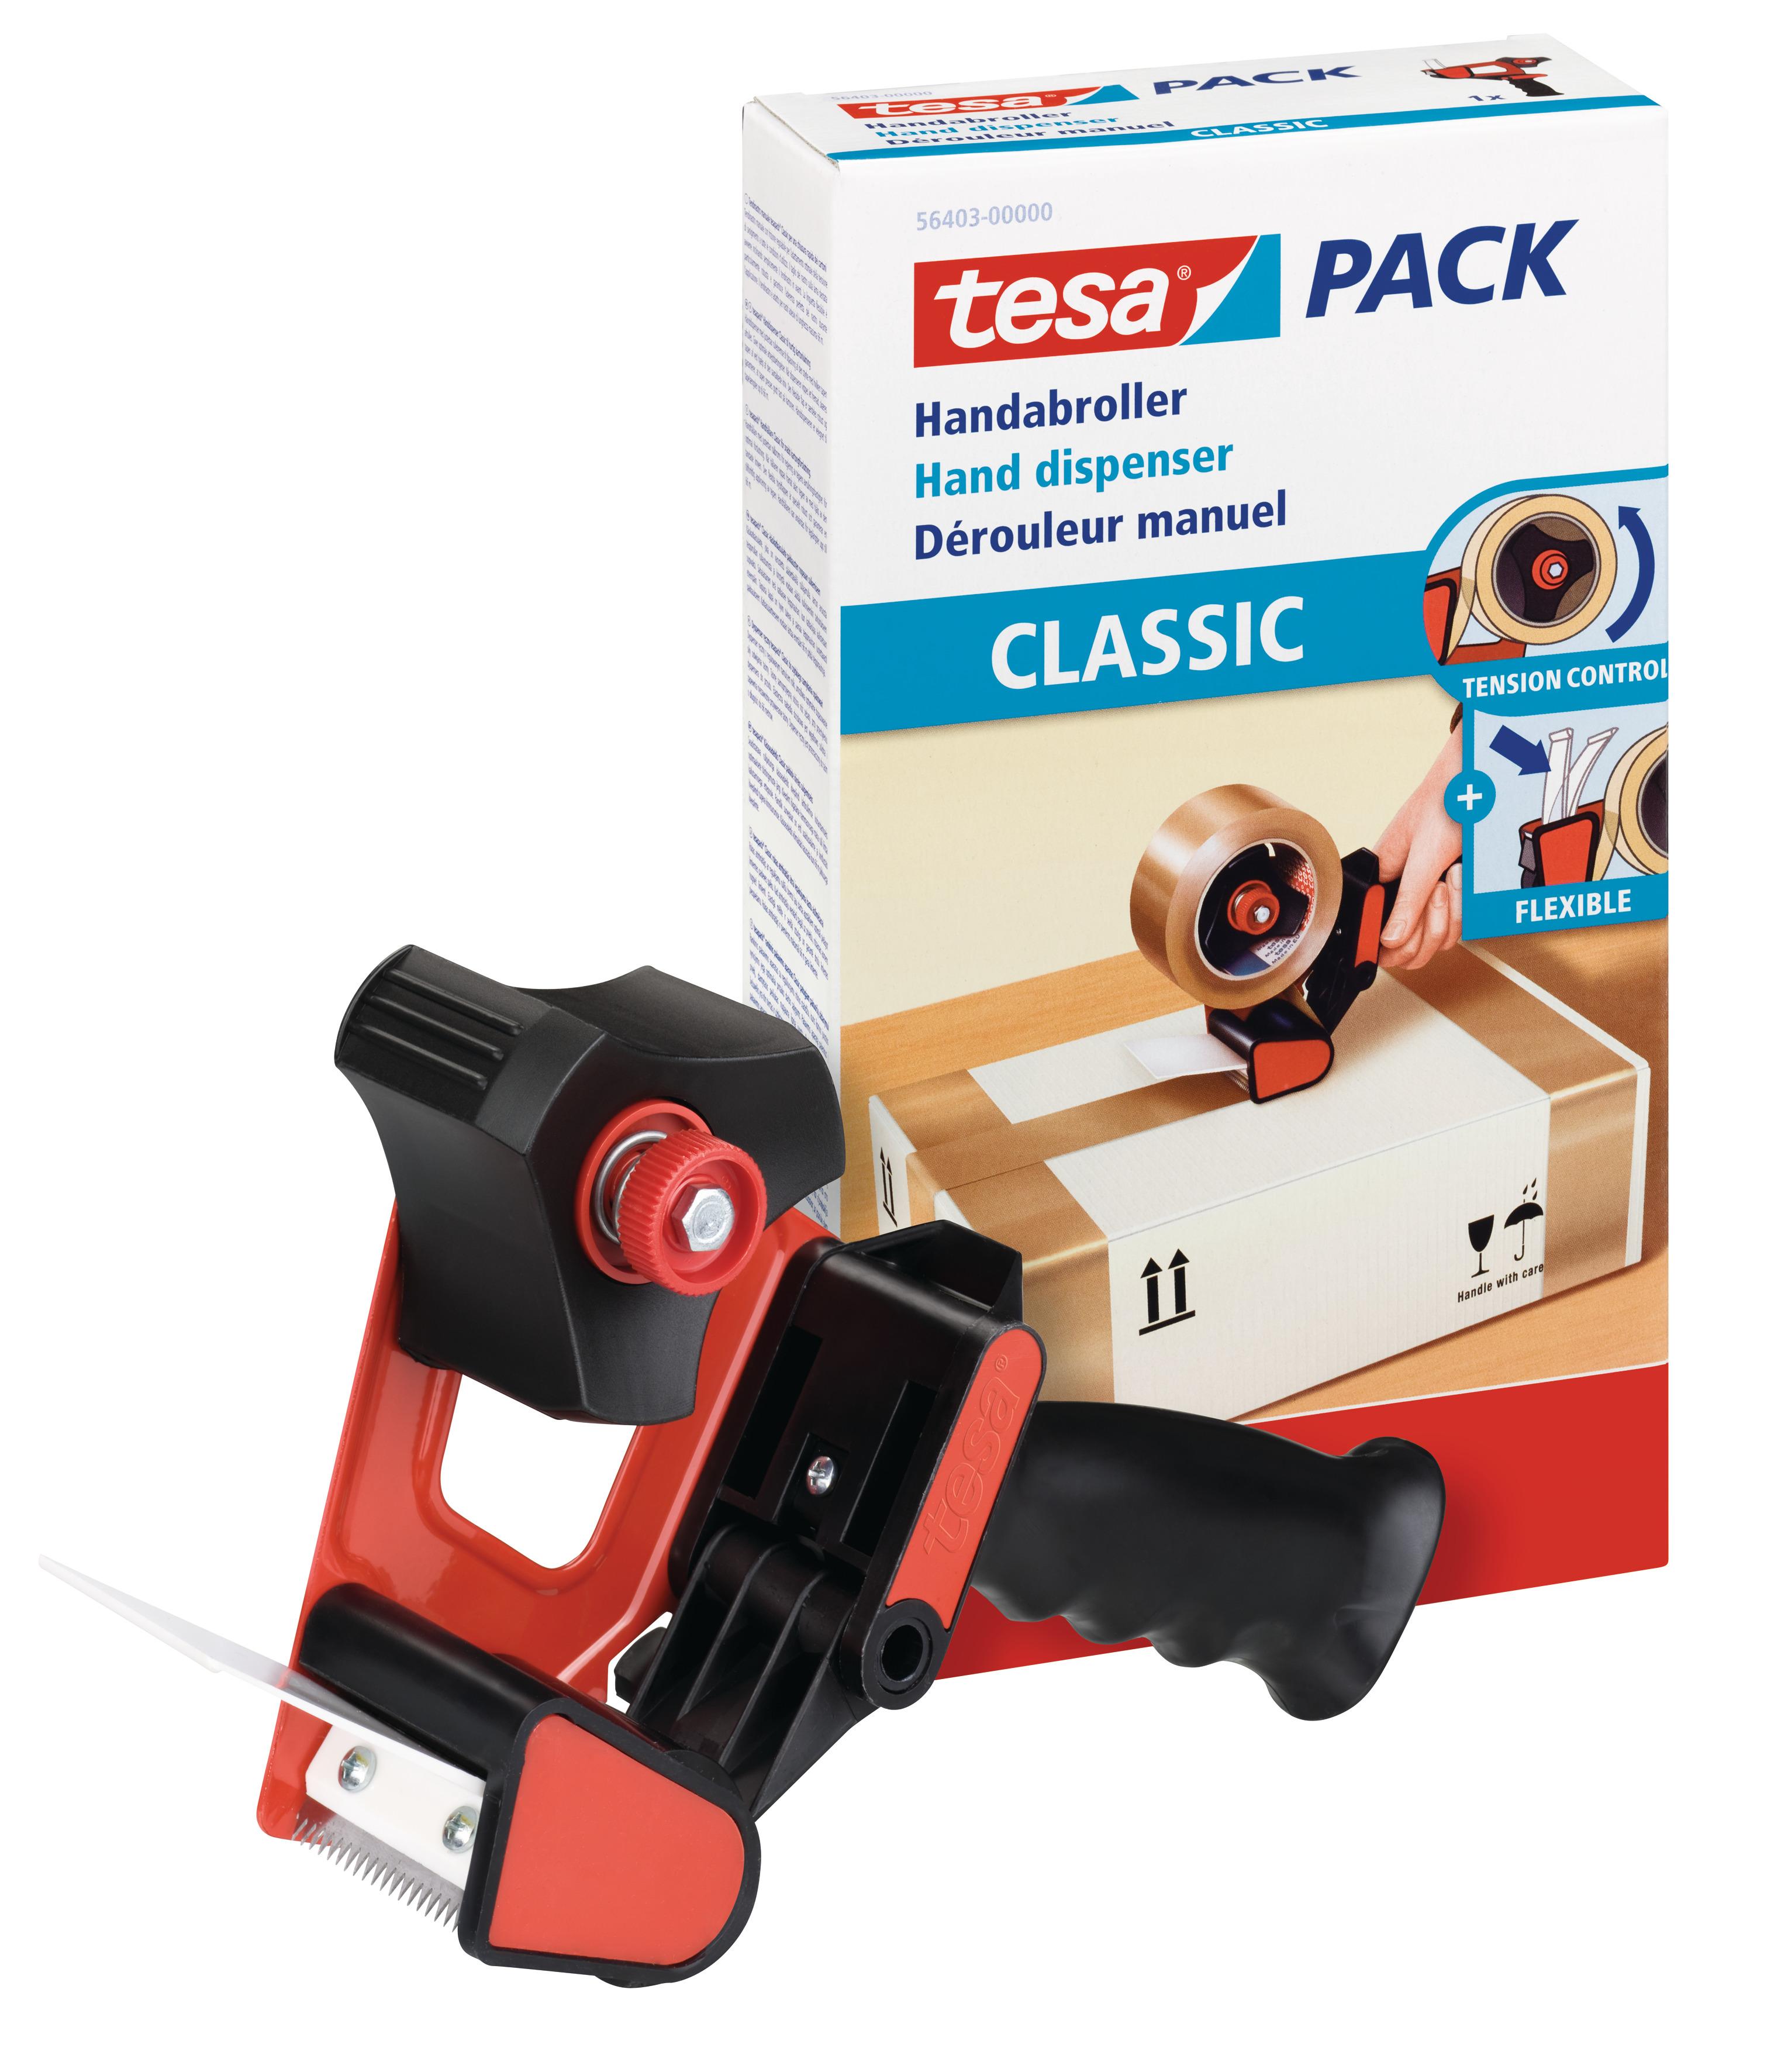 tesa Pack Handabroller classic